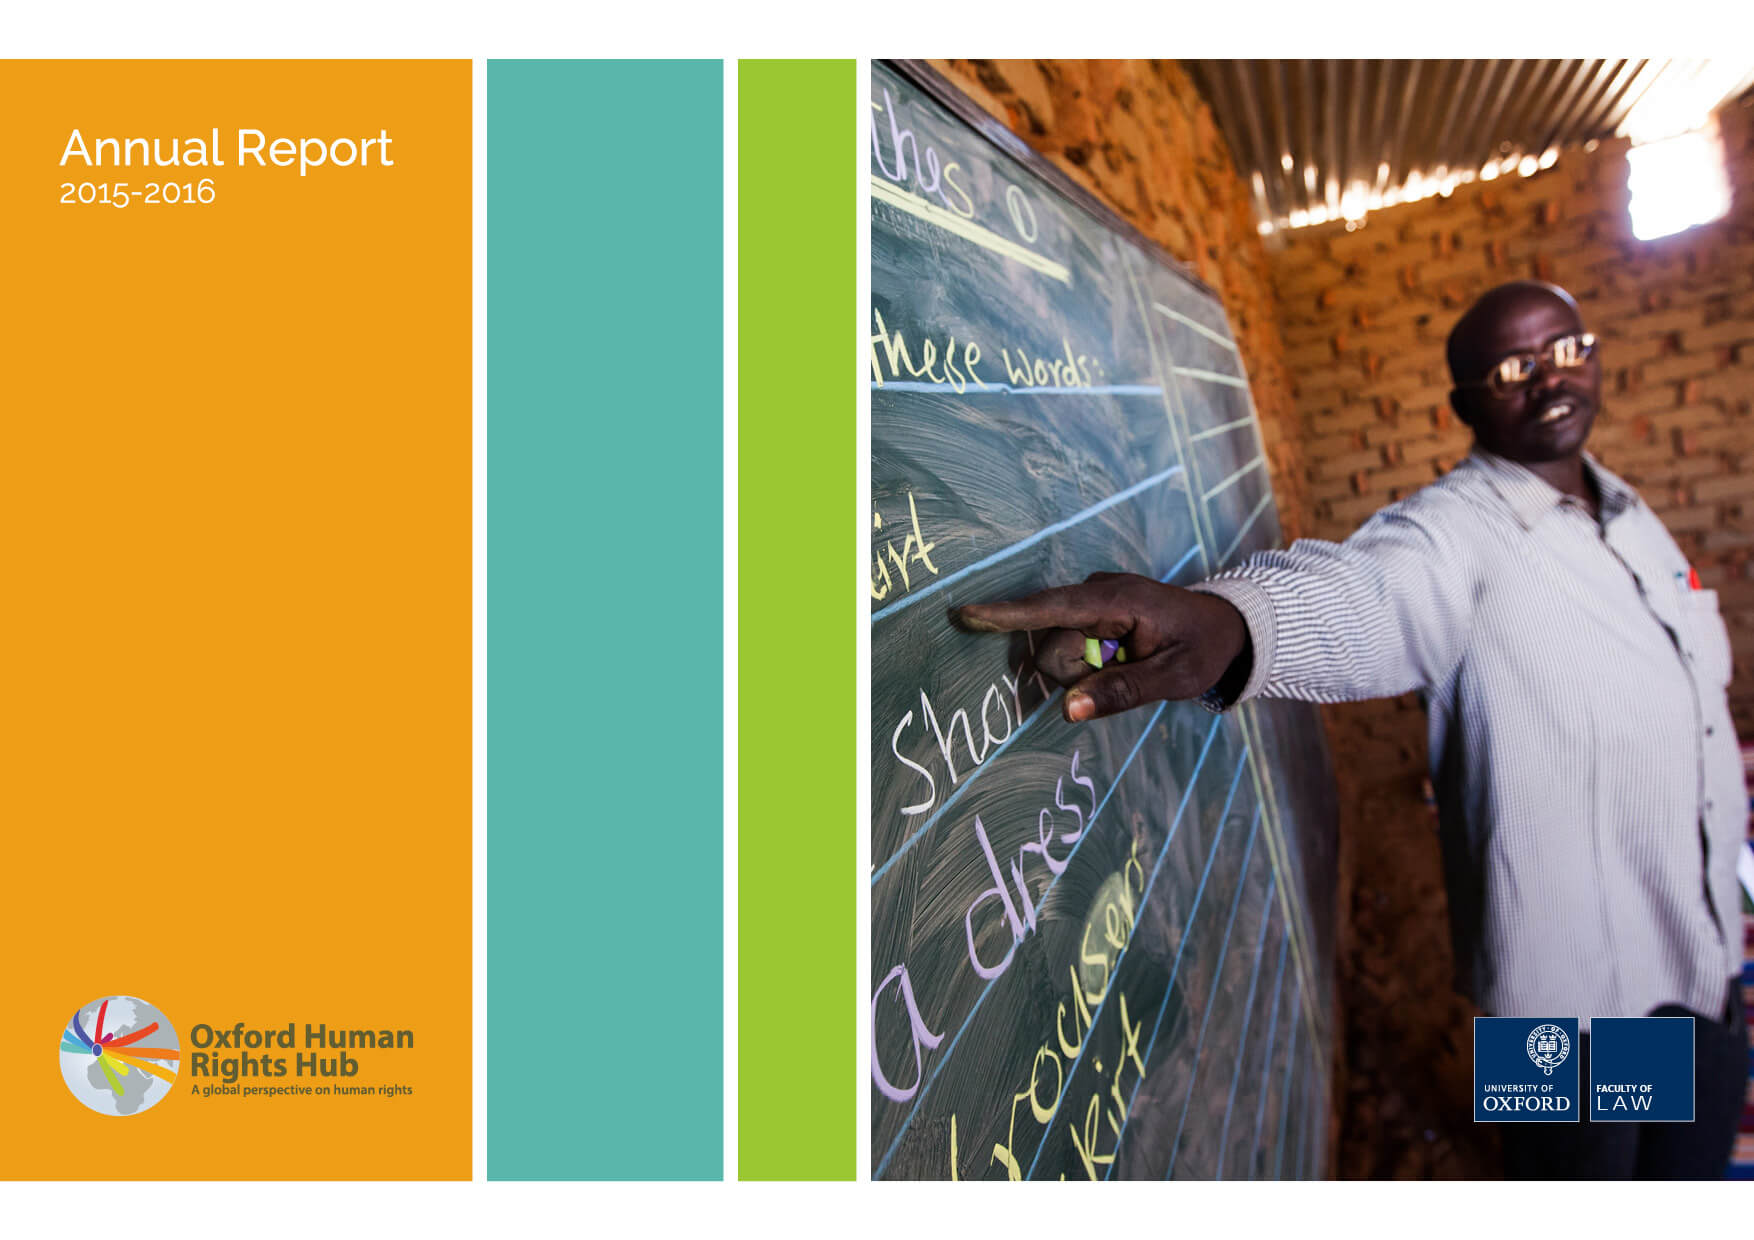 OxHRH Annual Report 2015-2016